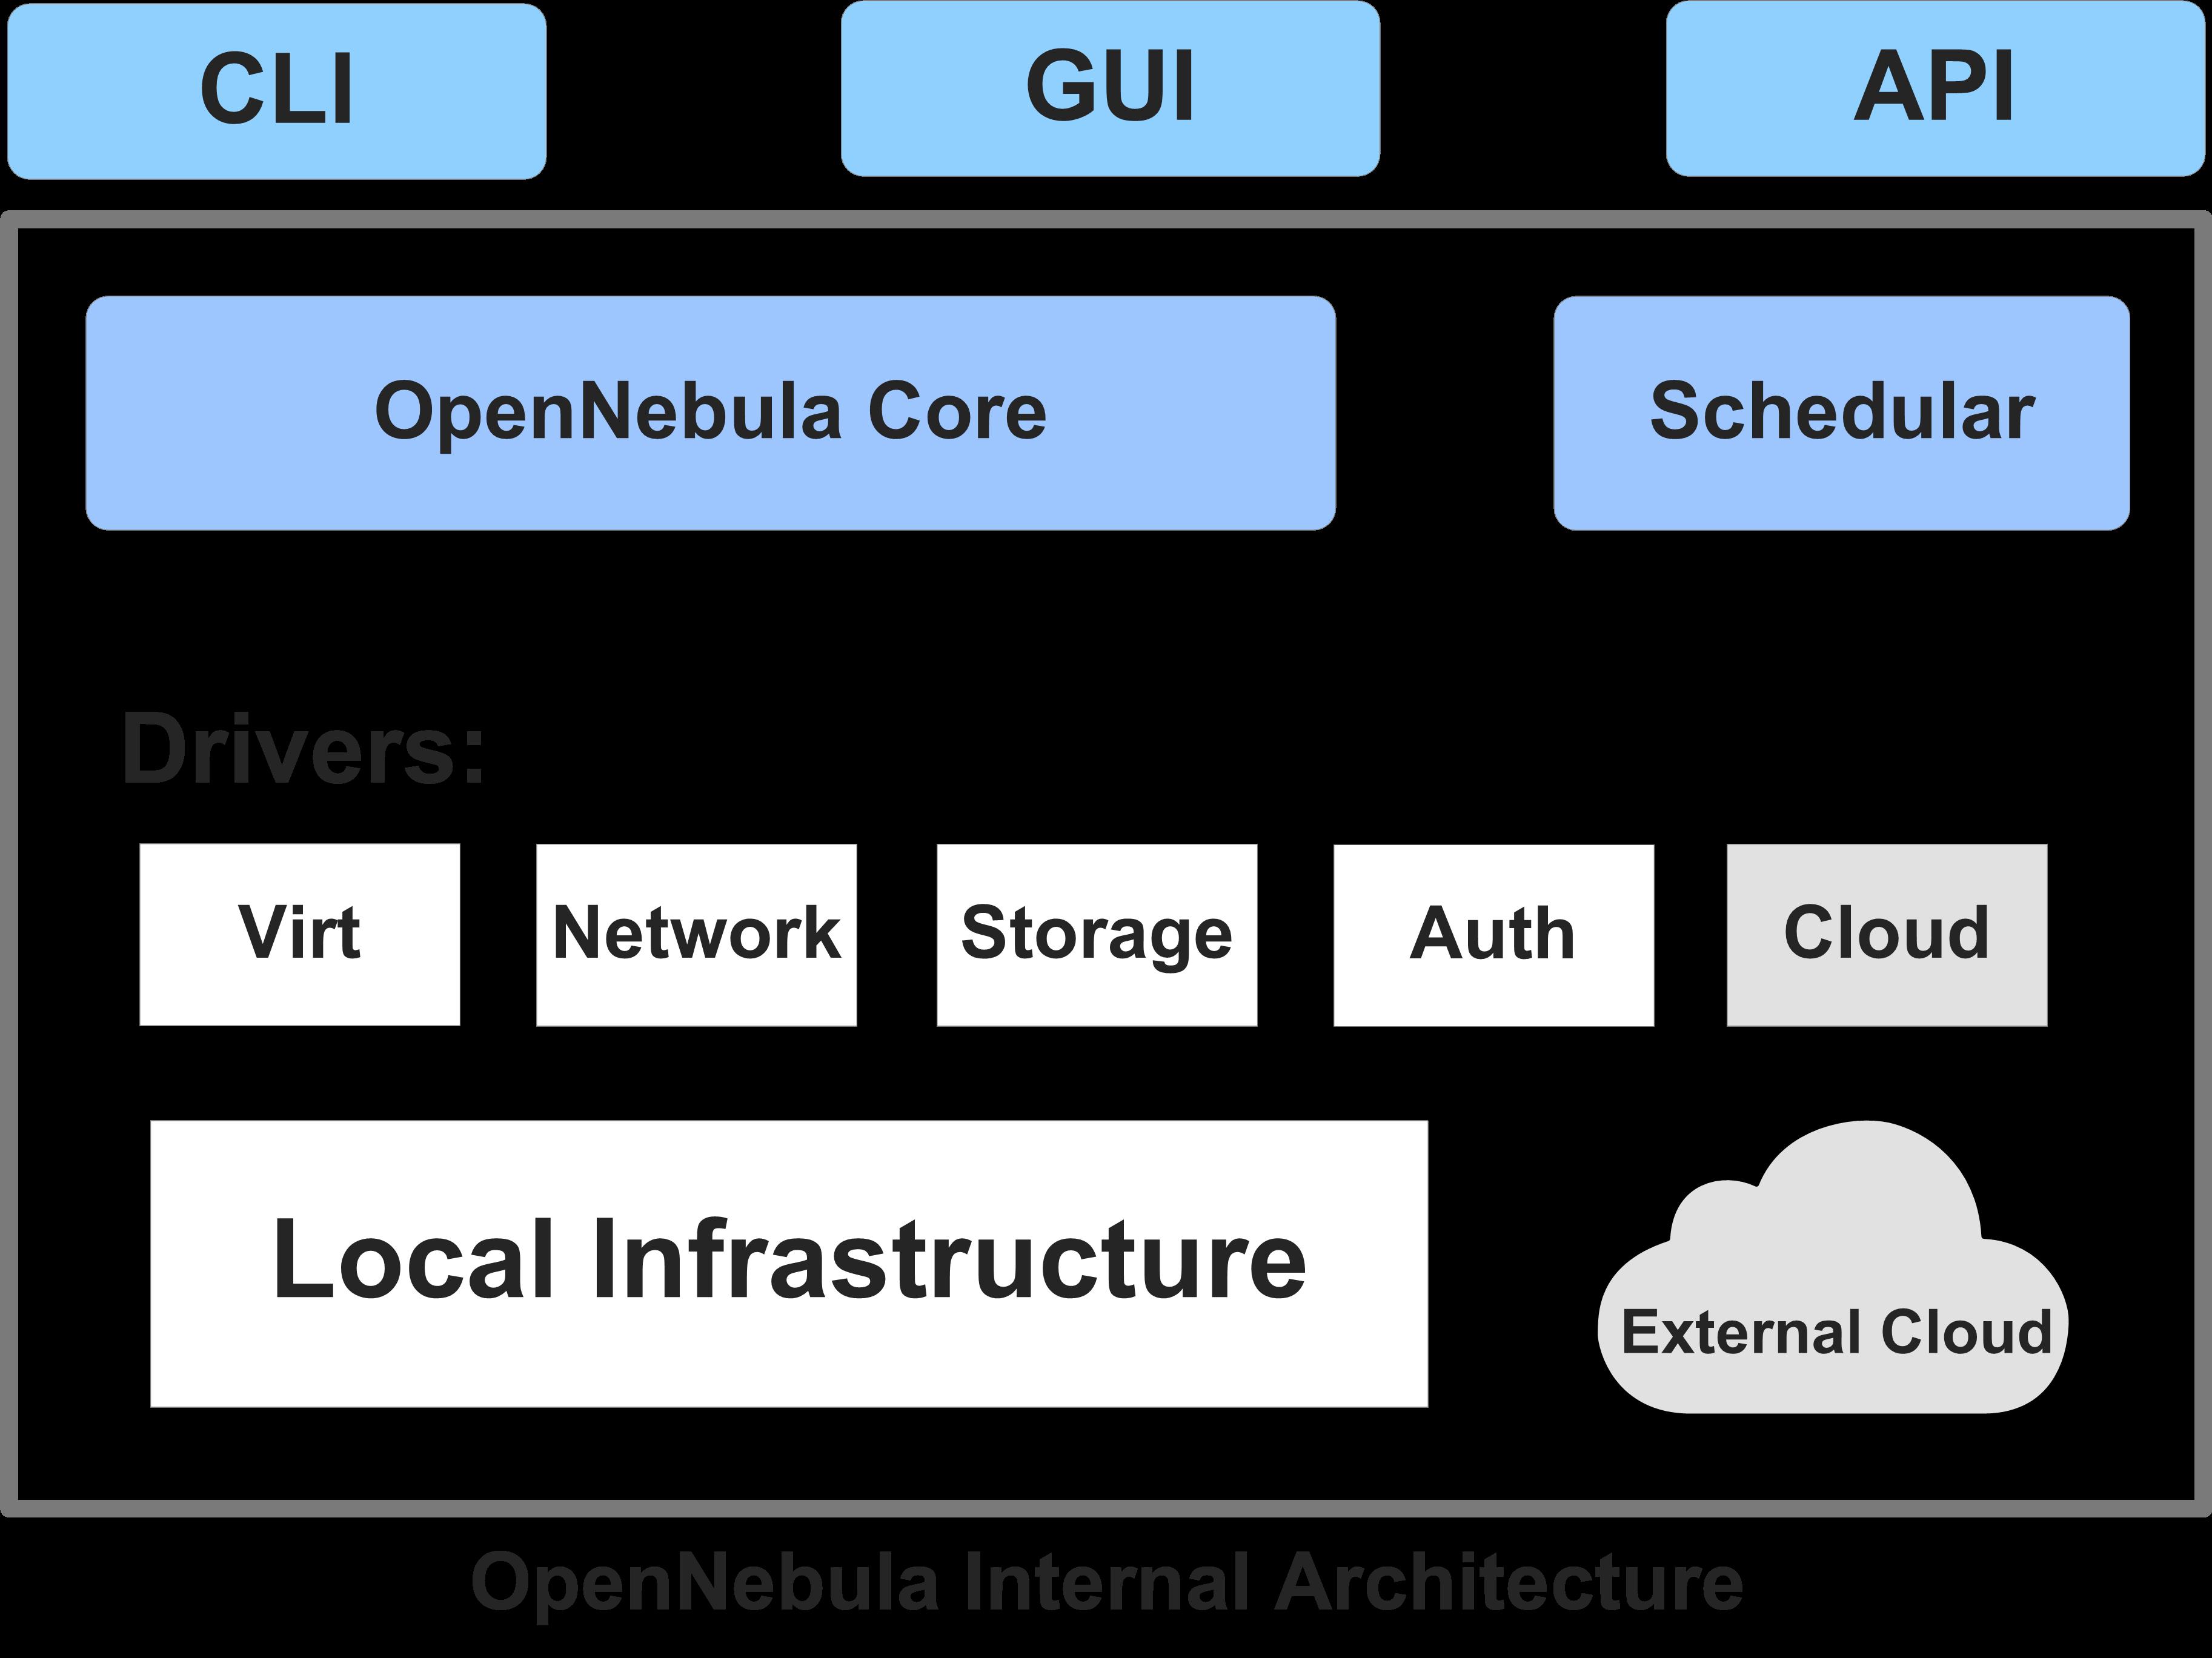 OpenNebula_Internal_Architecture.png